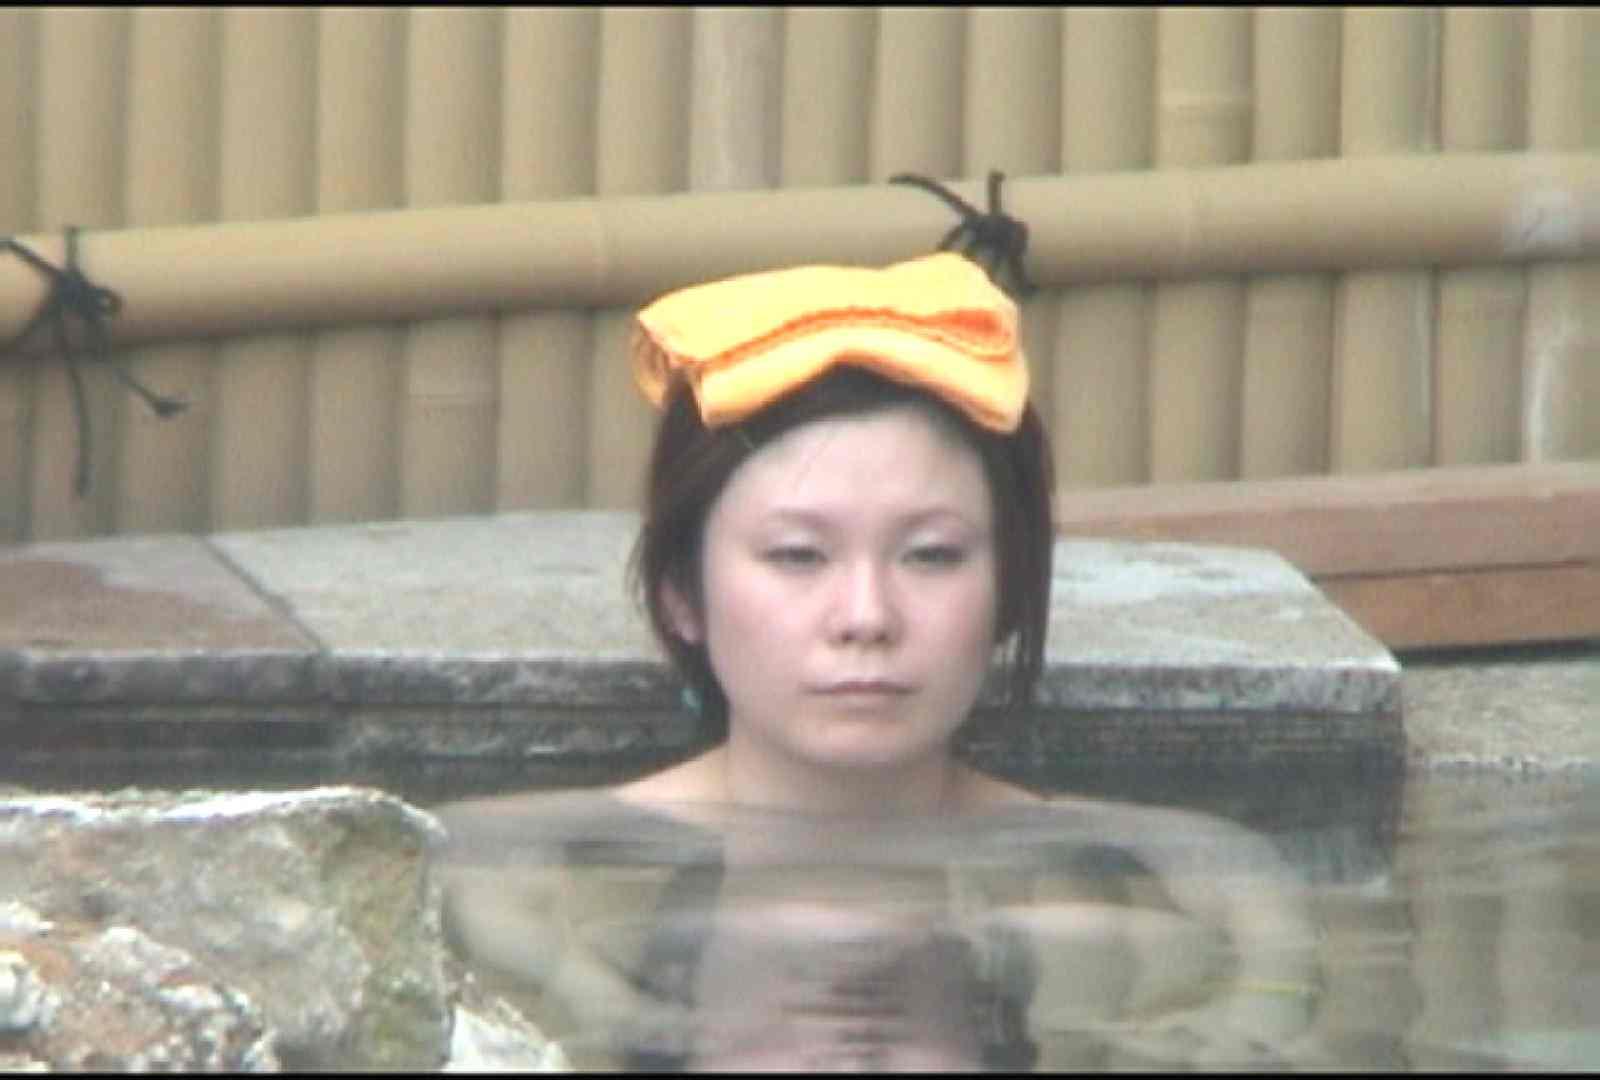 Aquaな露天風呂Vol.177 盗撮師作品  102pic 99